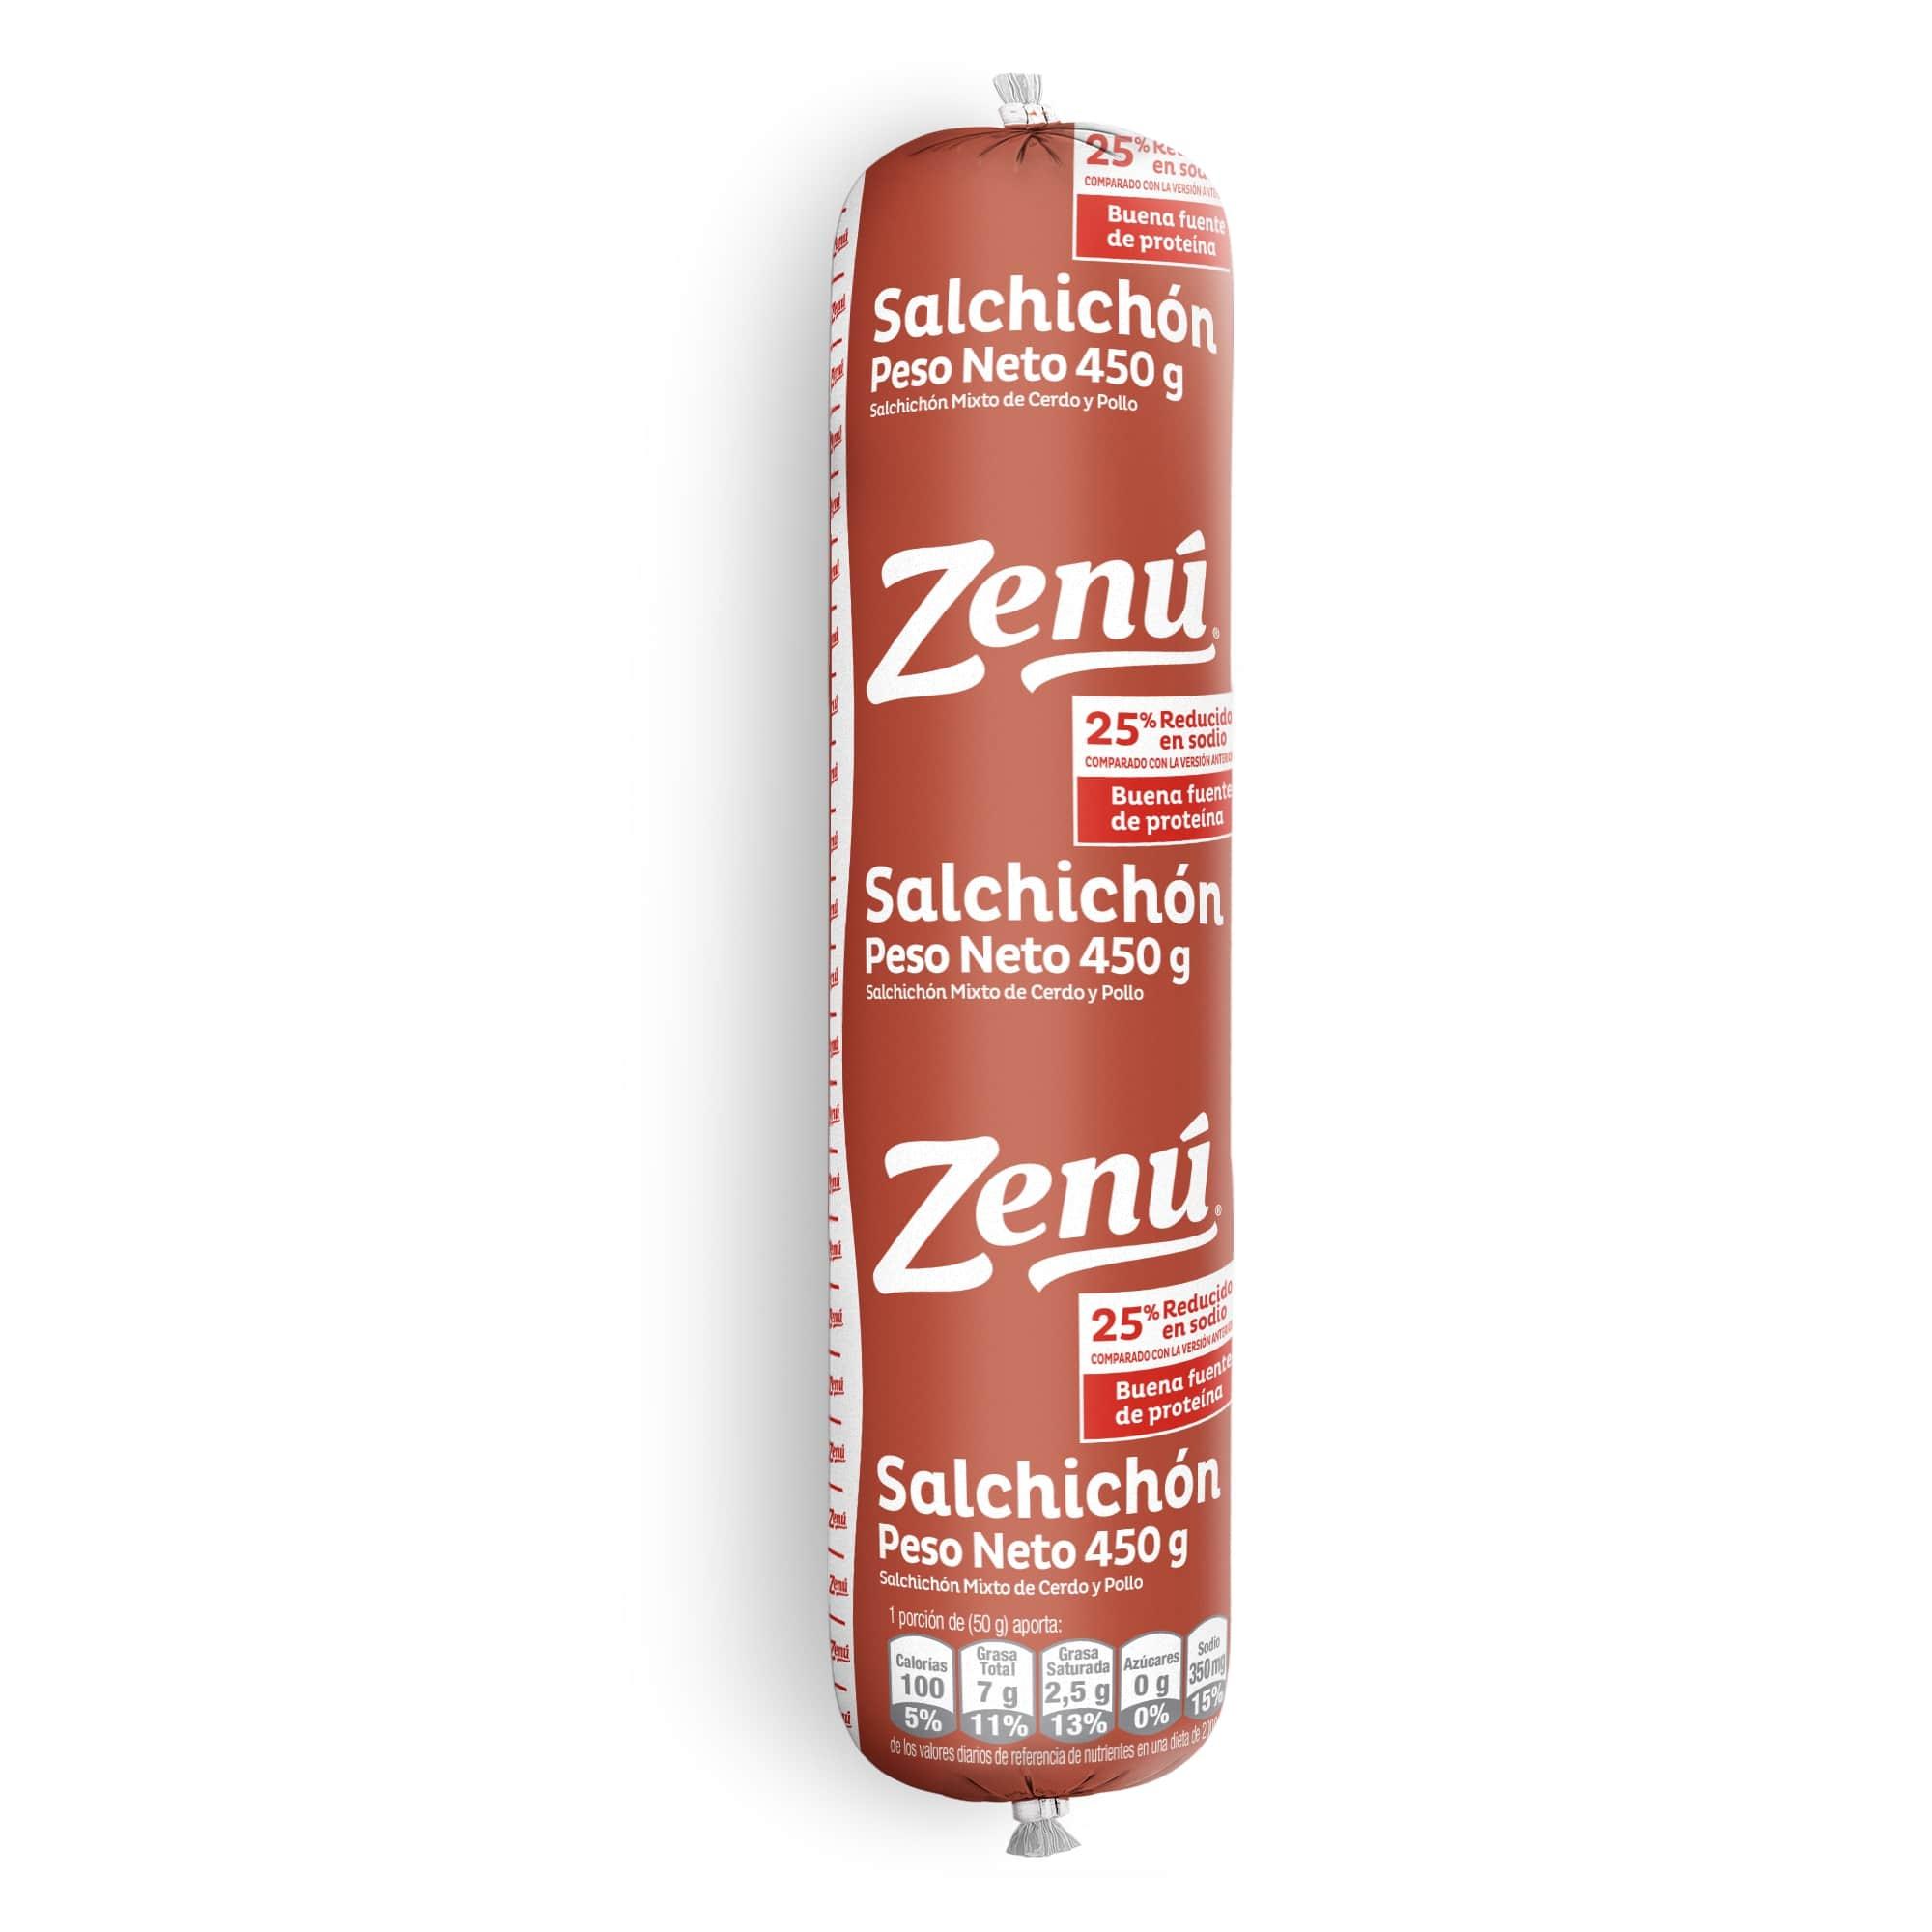 Salchichón Tradicional Zenu 450g